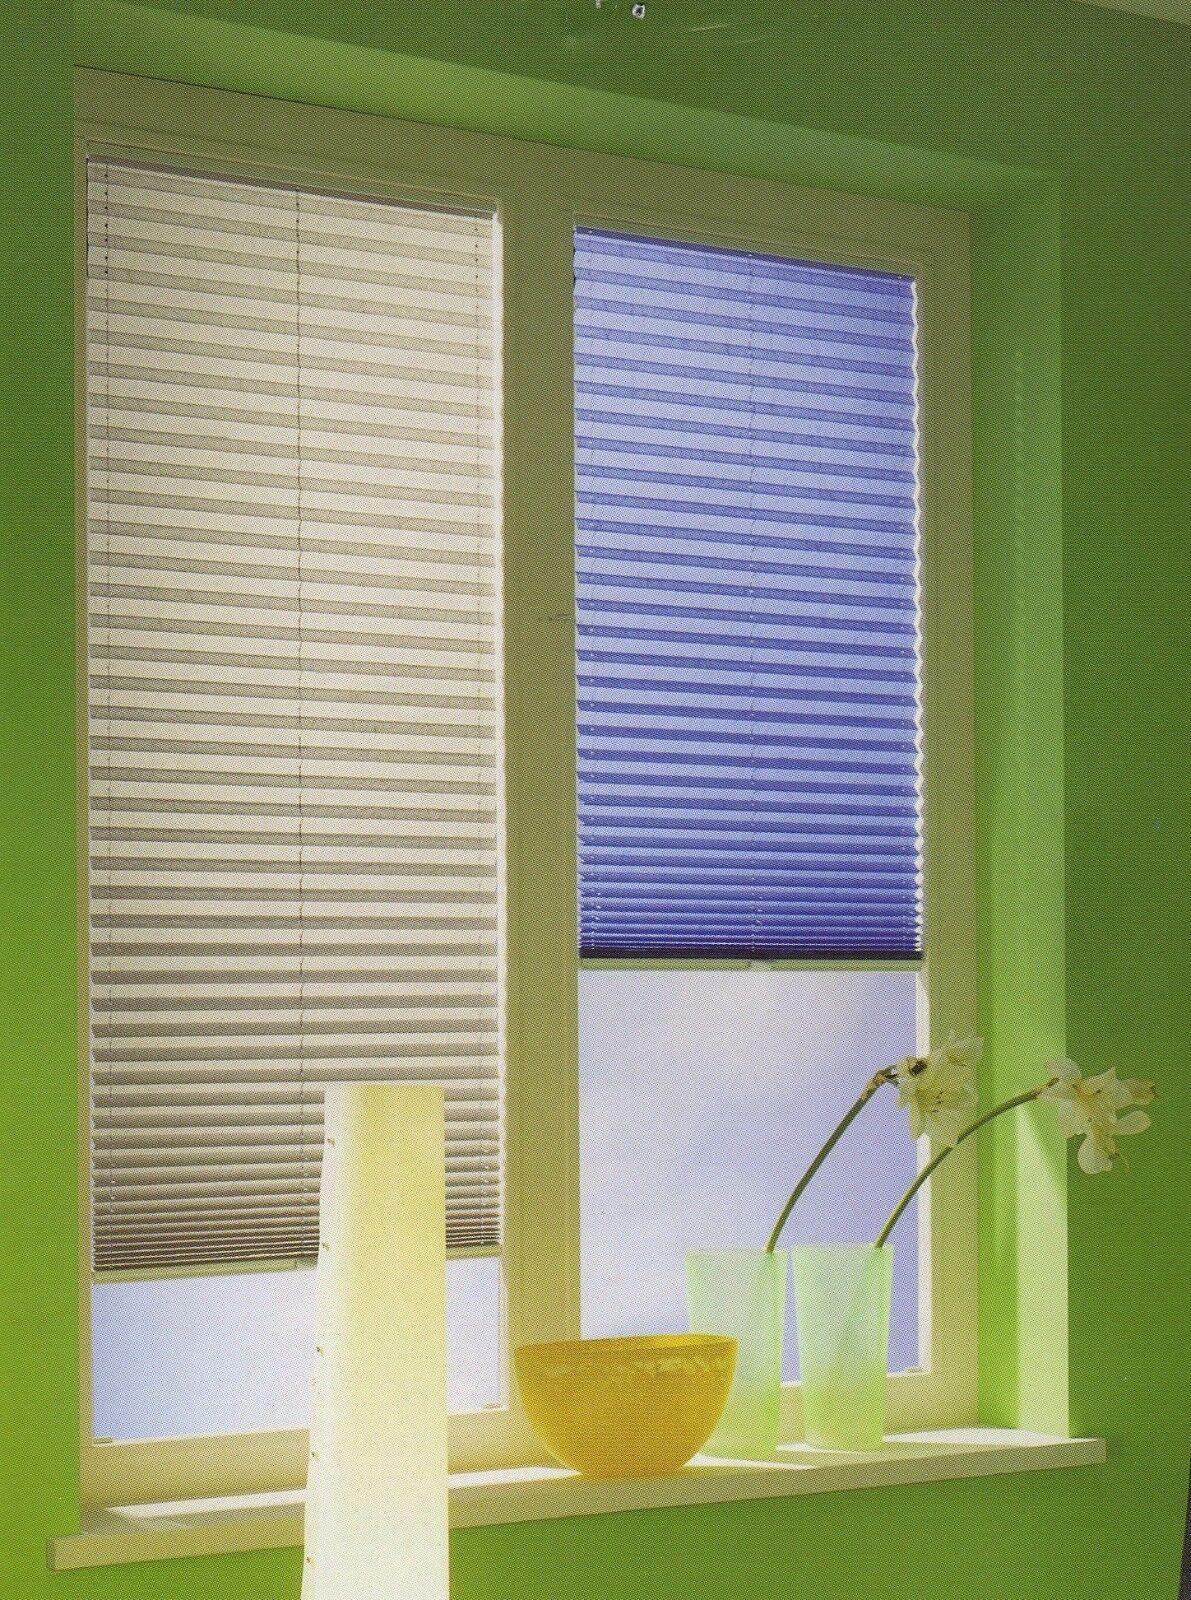 Plissee Faltrollo Stoffe gegen Sonne Hitze nach Maß Maßanfertigung viele Farben